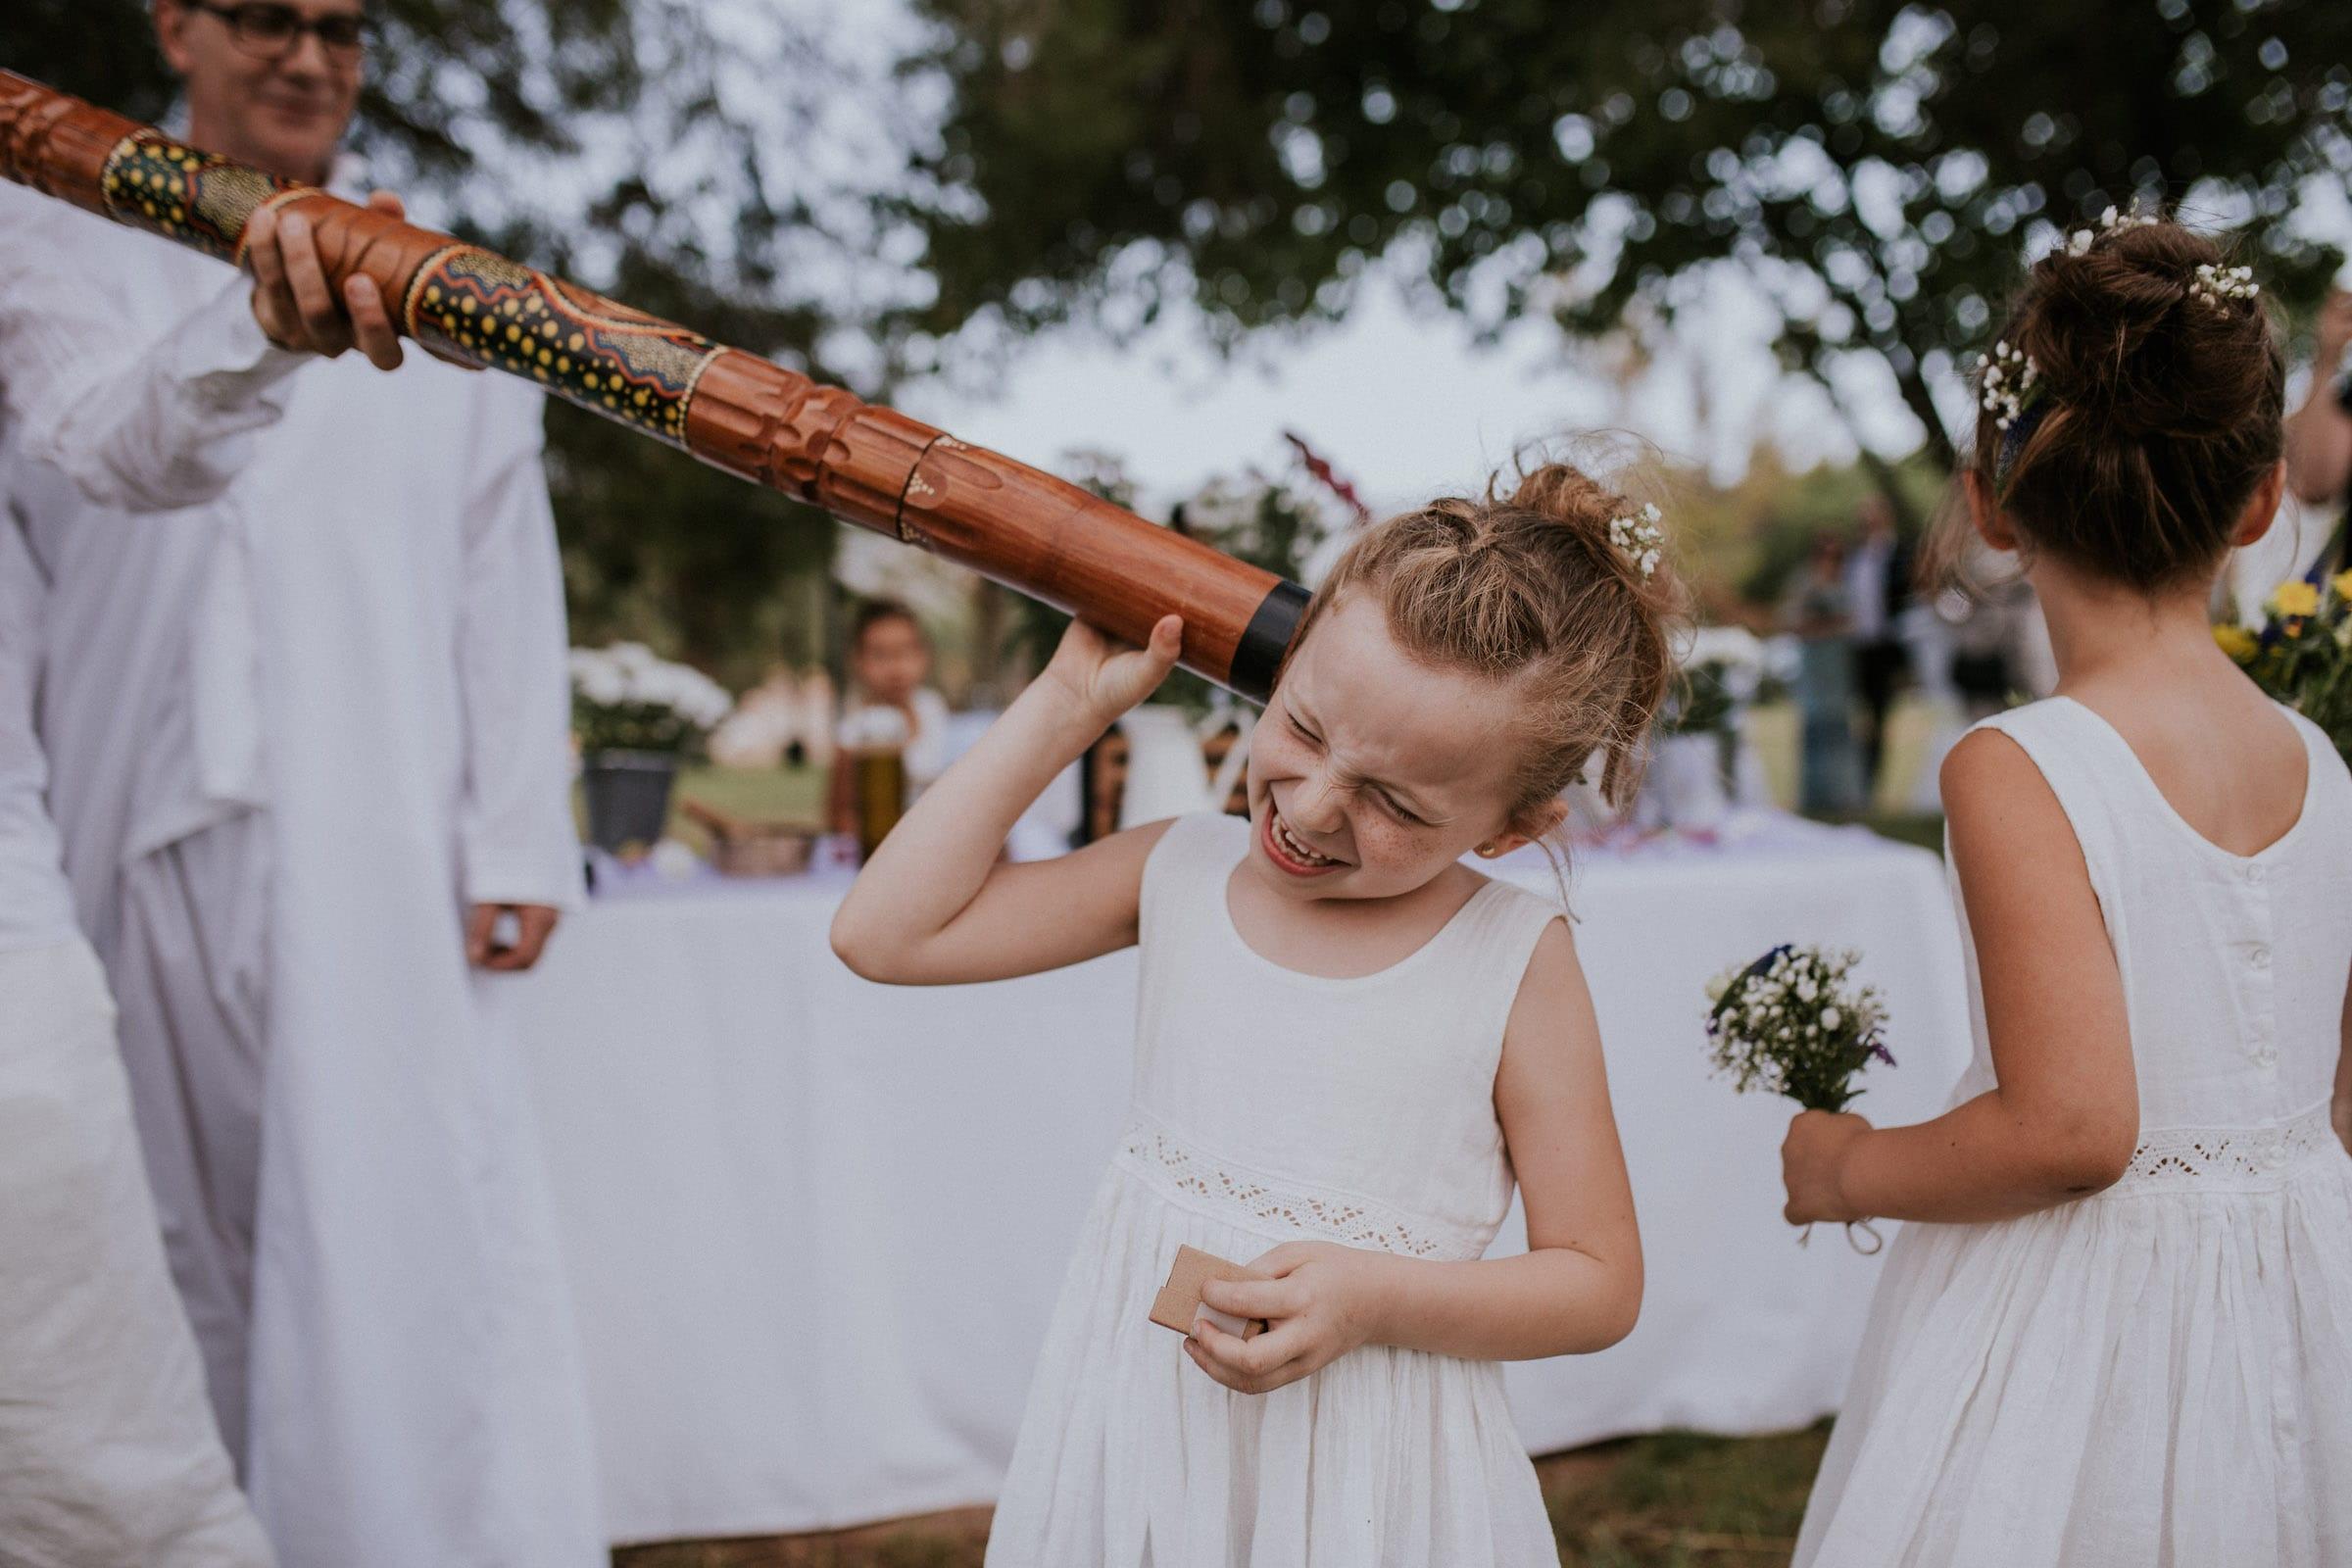 067+wedding+in+valencia+weddingphotographer.jpg